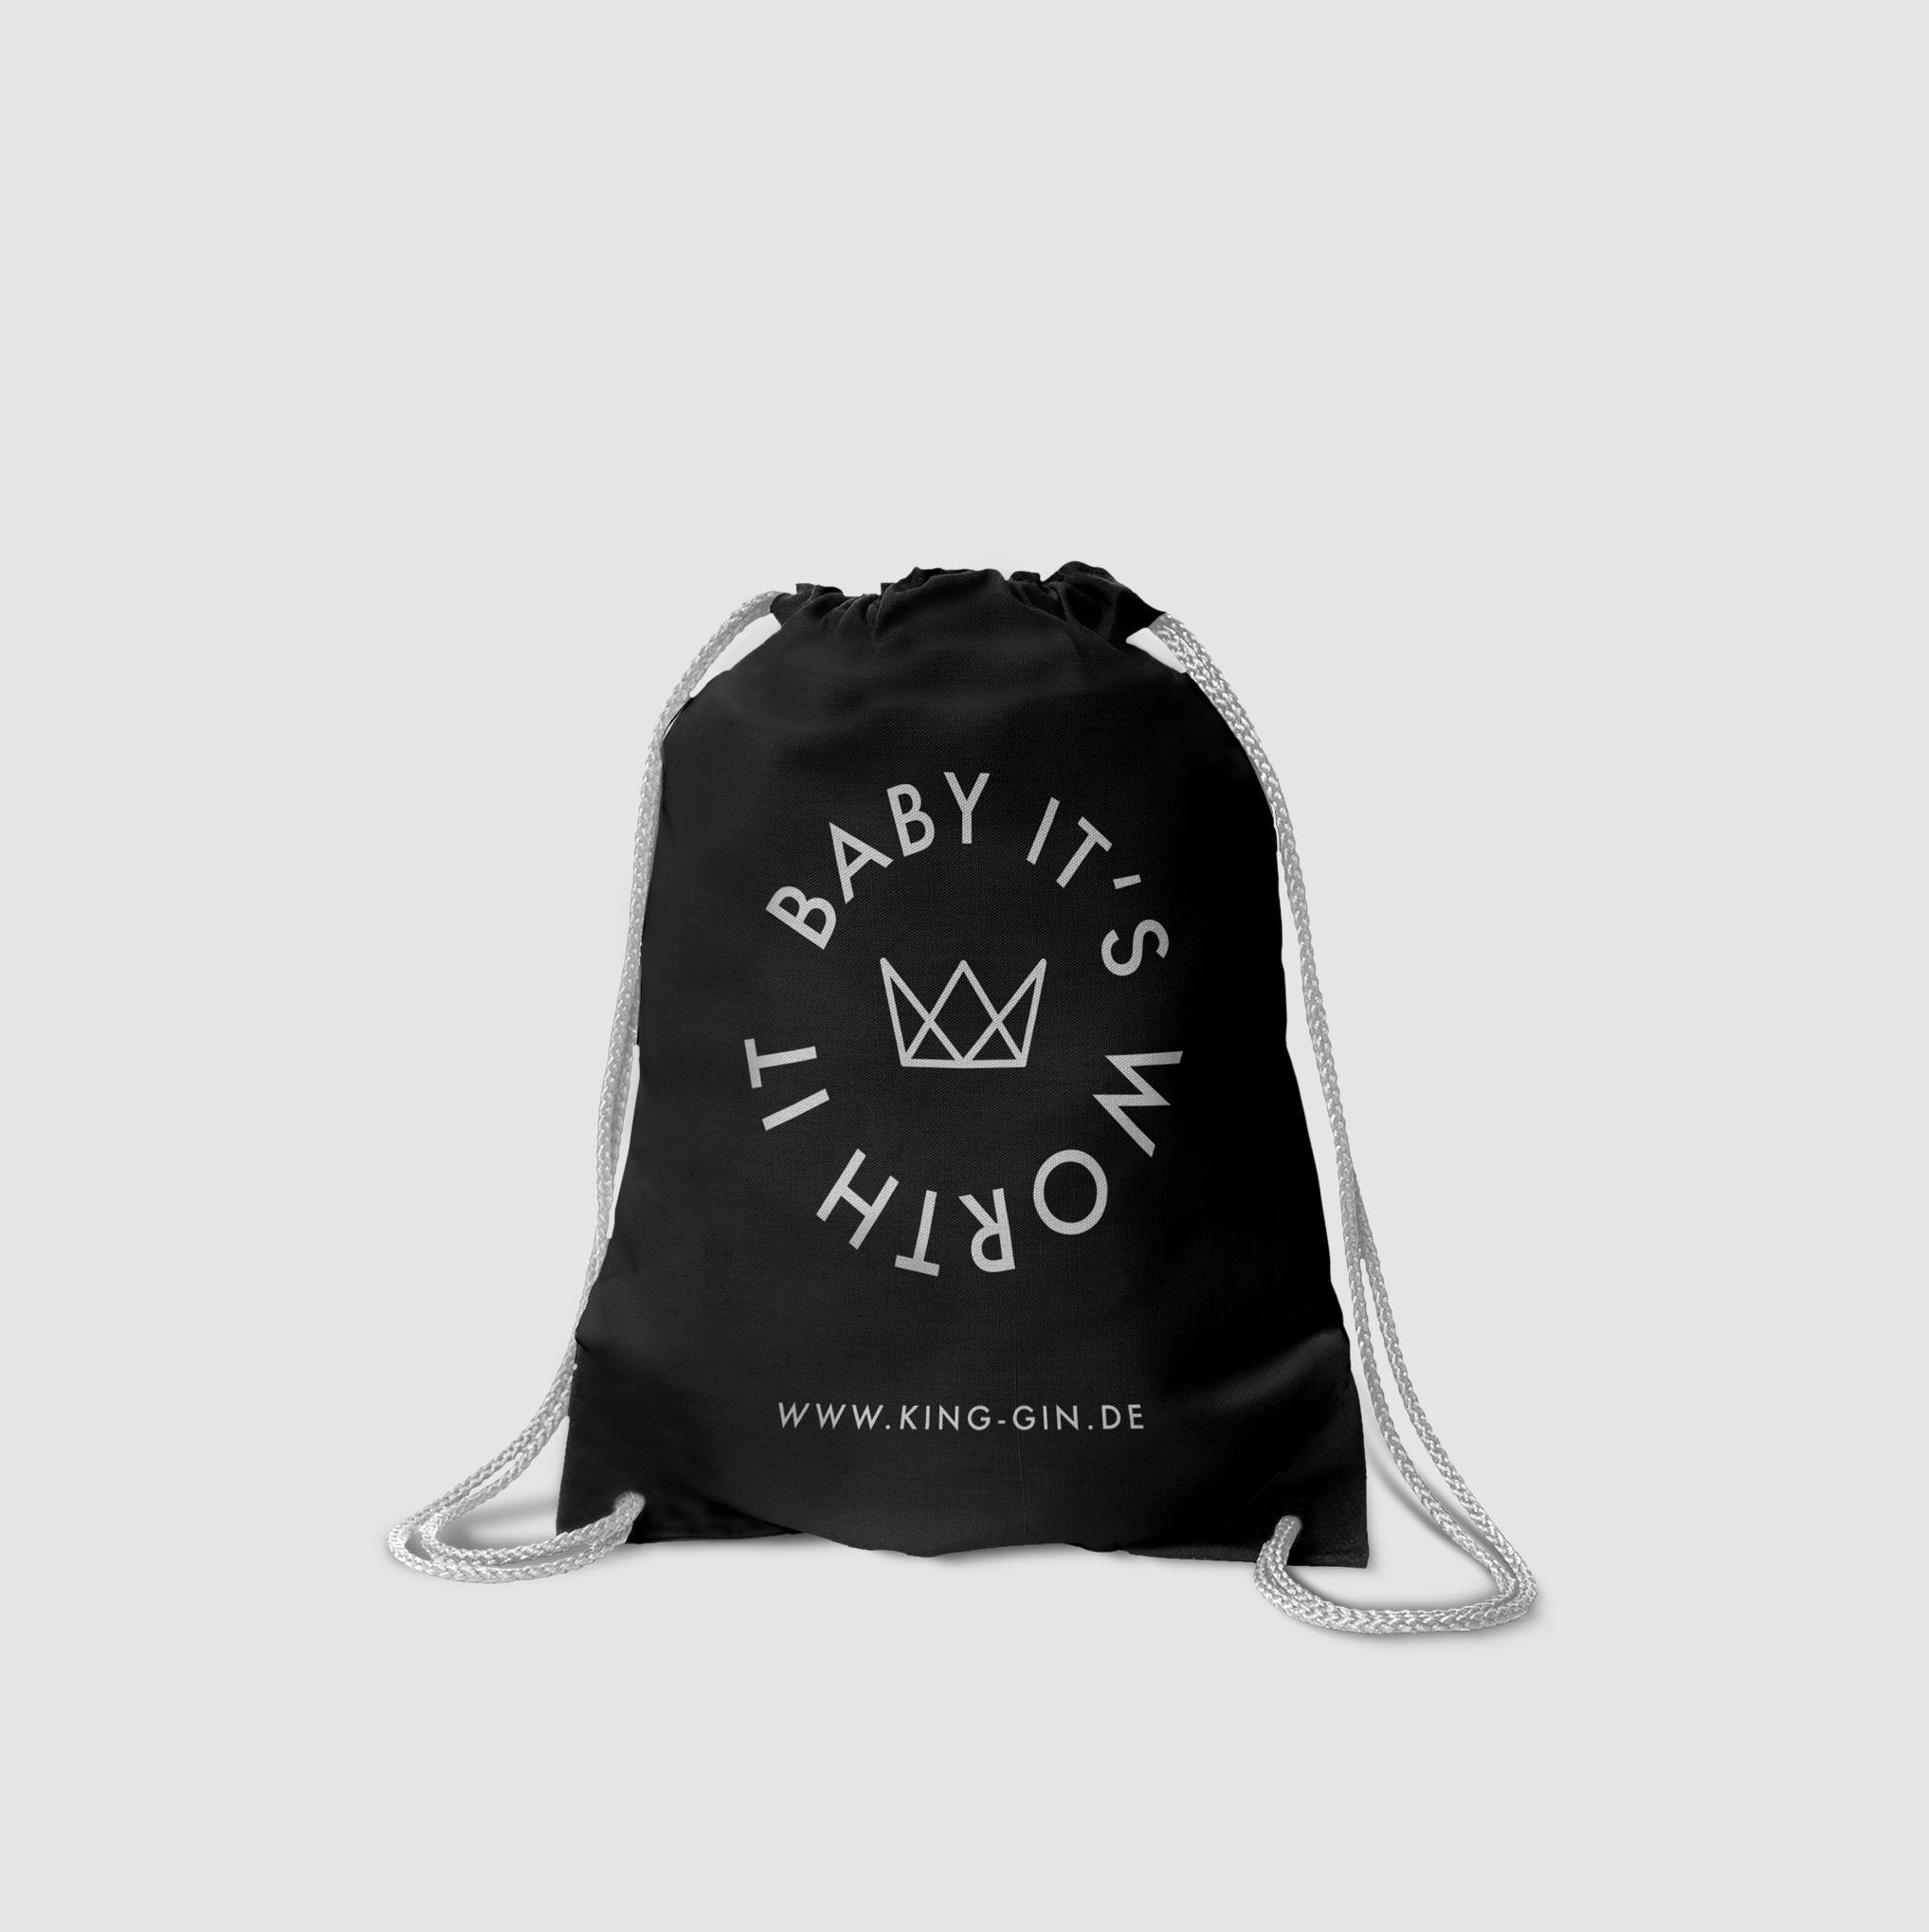 The King Gin - Bag